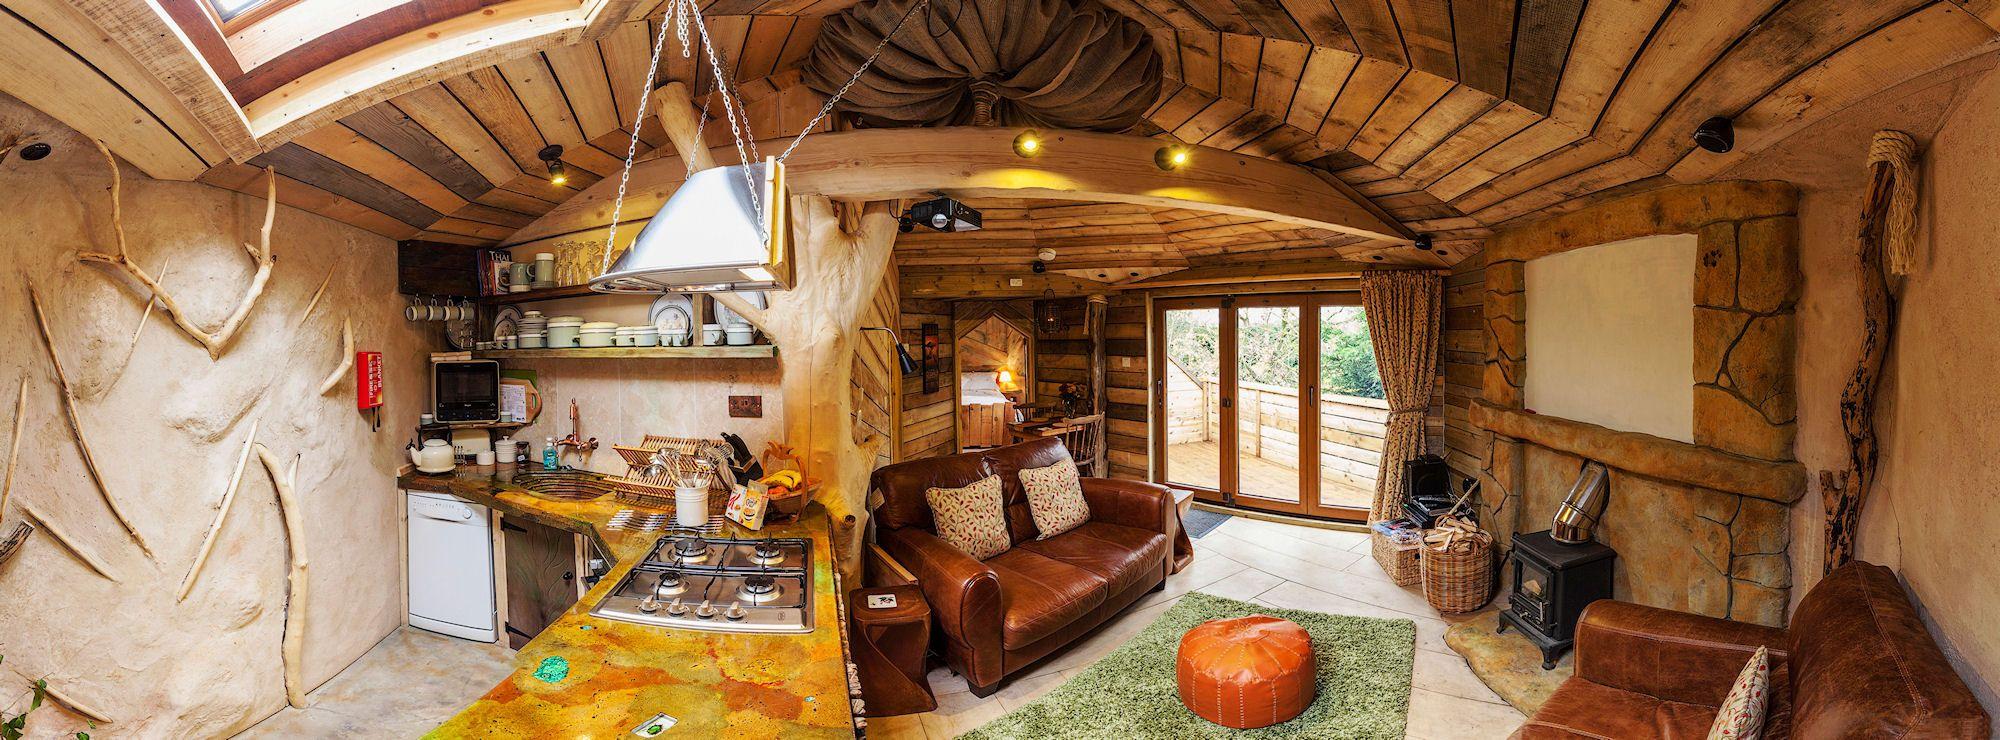 tree house google search udeas pinterest treehouse - Tree House Interior Ideas